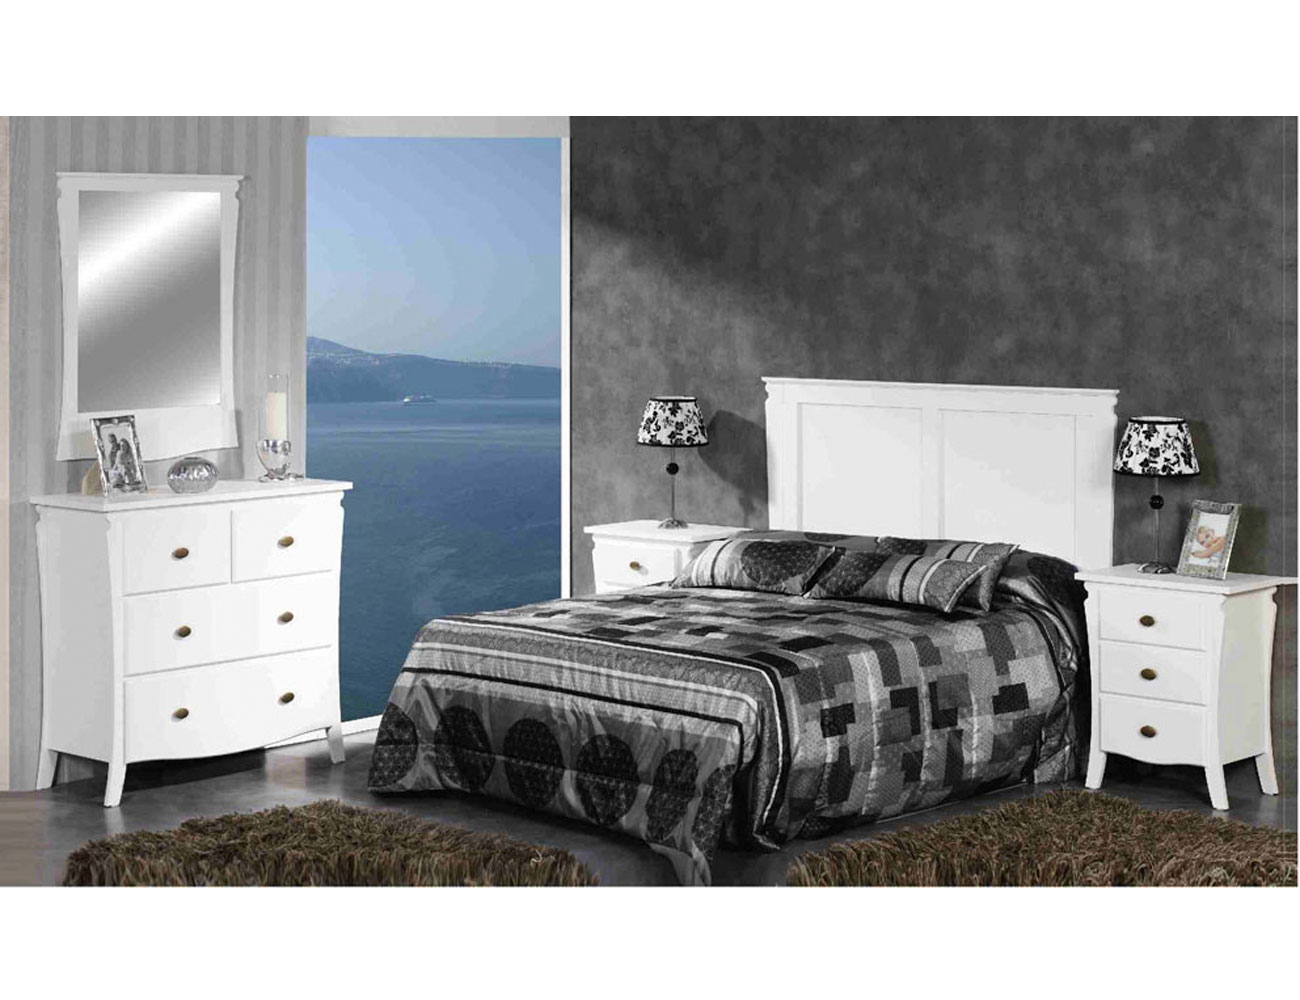 Dormitorio matrimonio blanco lacado madera dm1